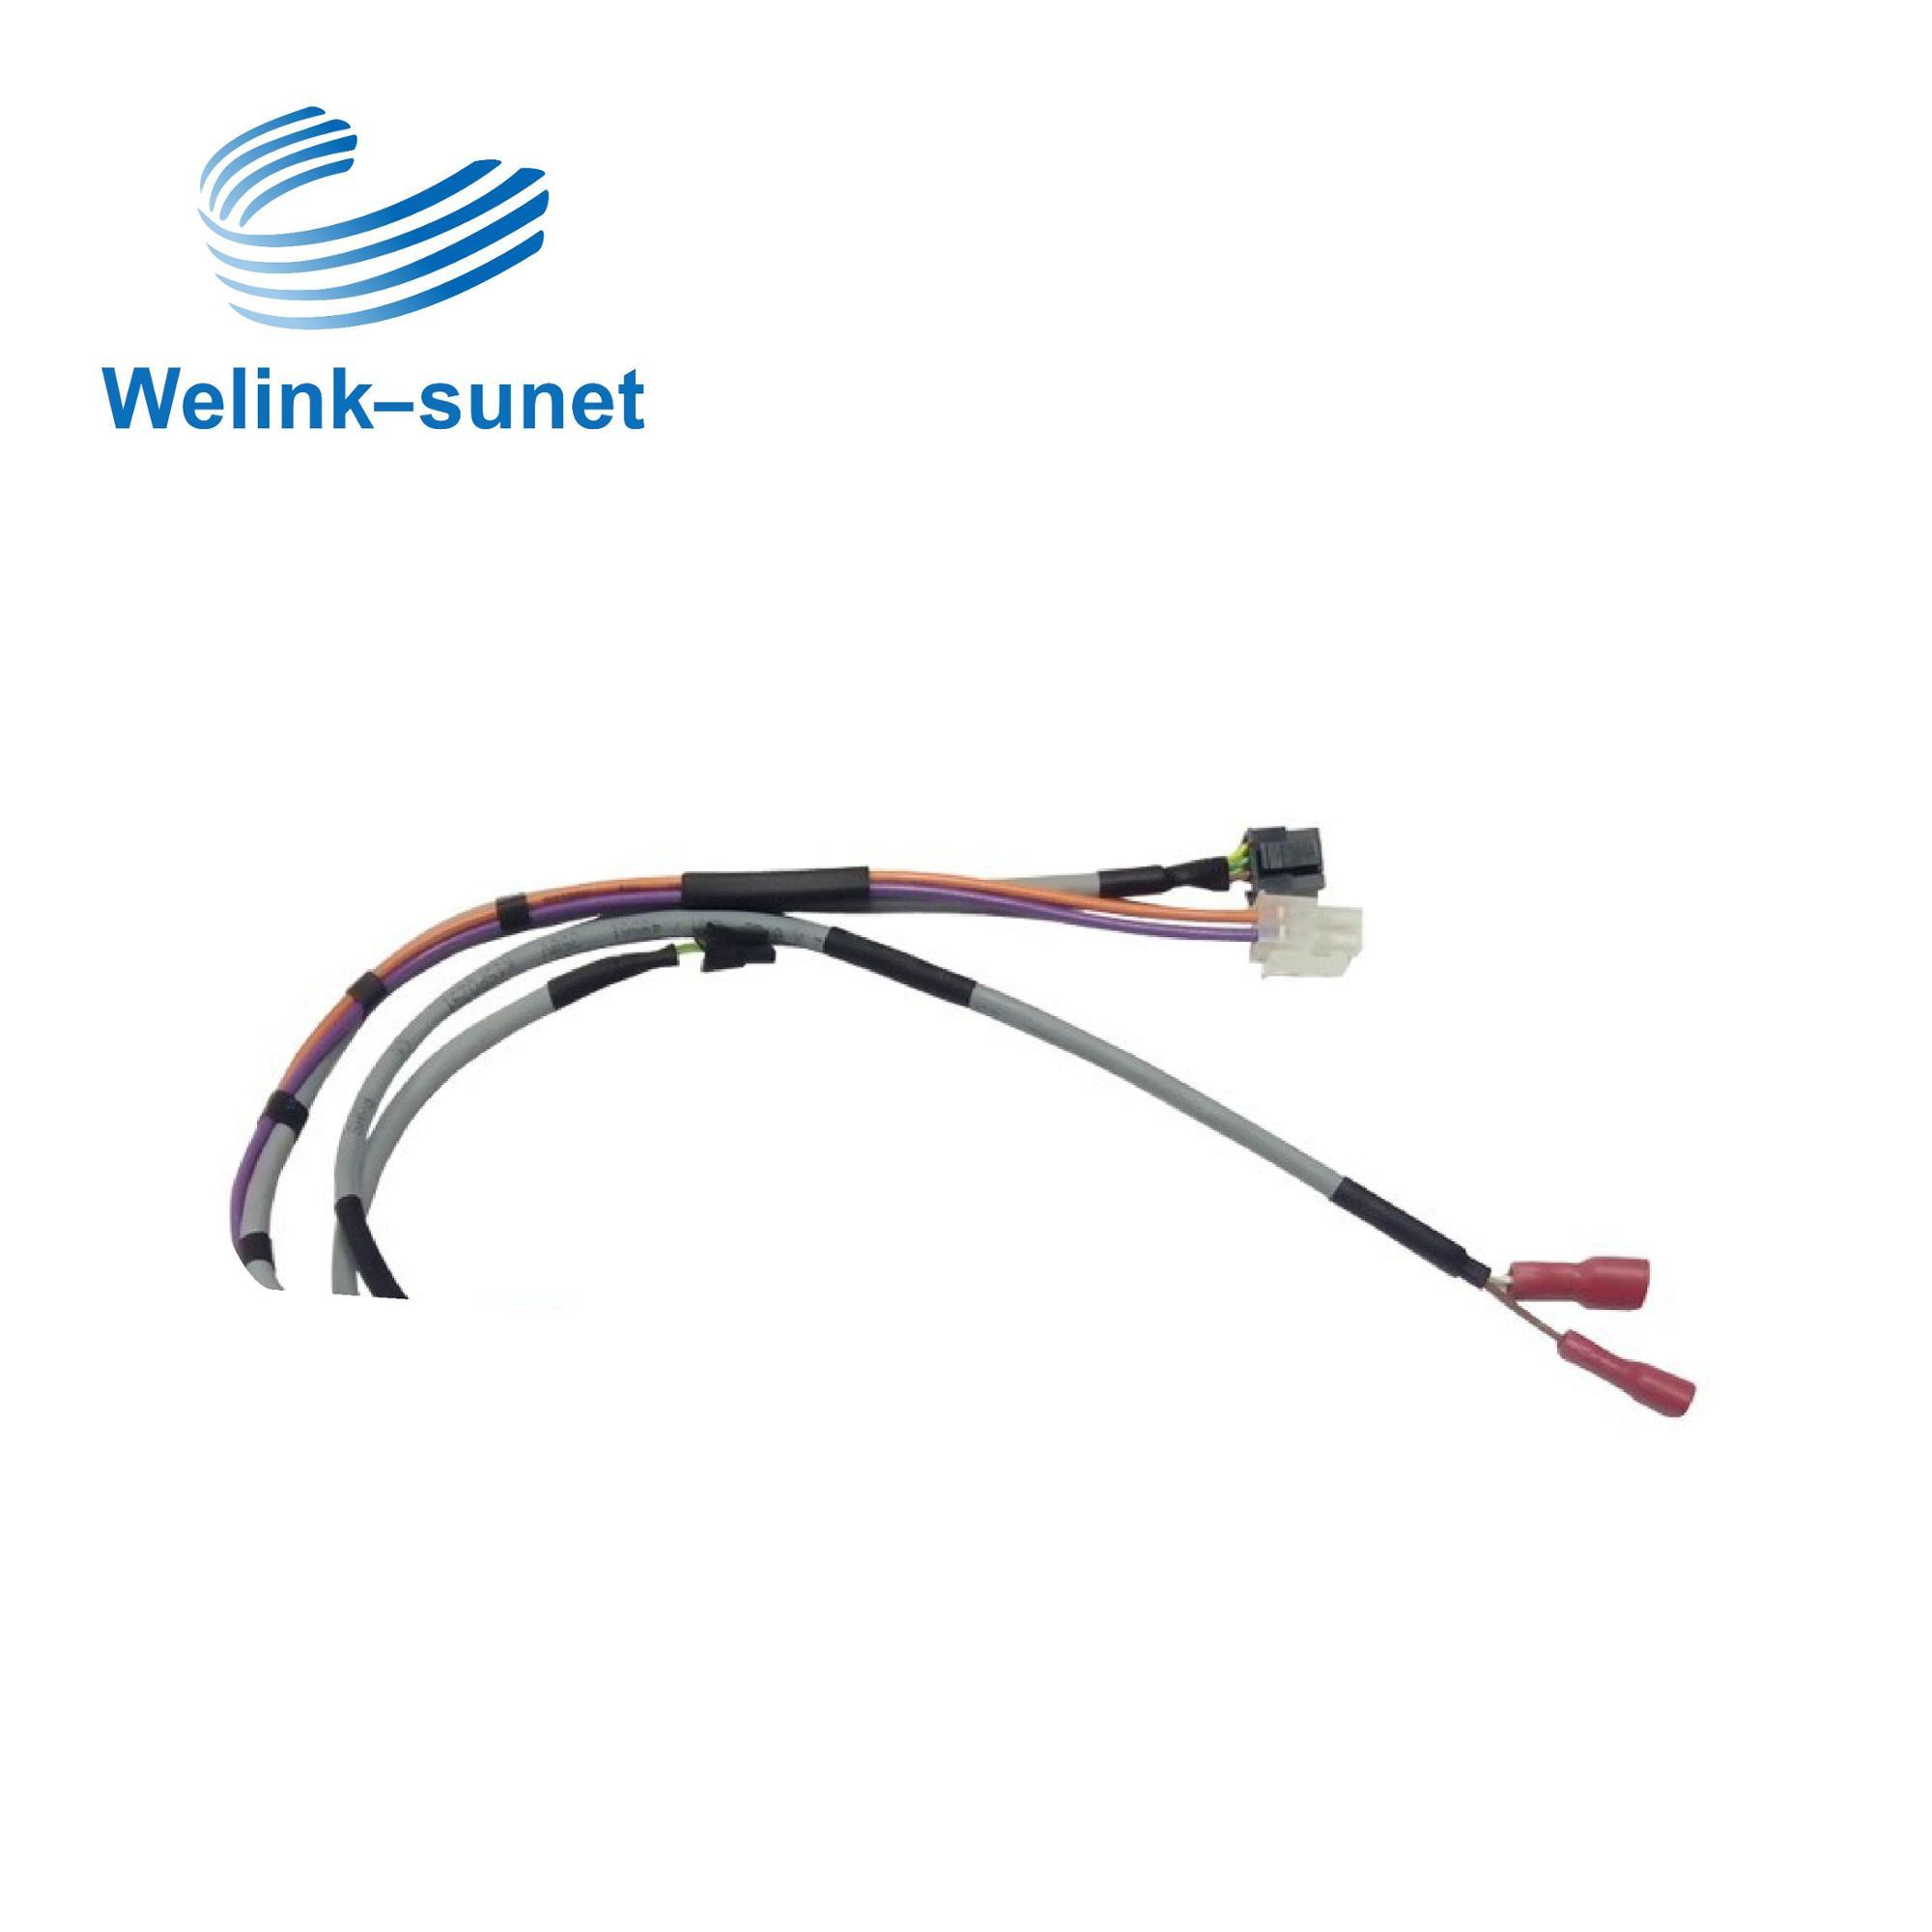 Molex Mic Fit 24p Add Super Flexible Cable The Machine